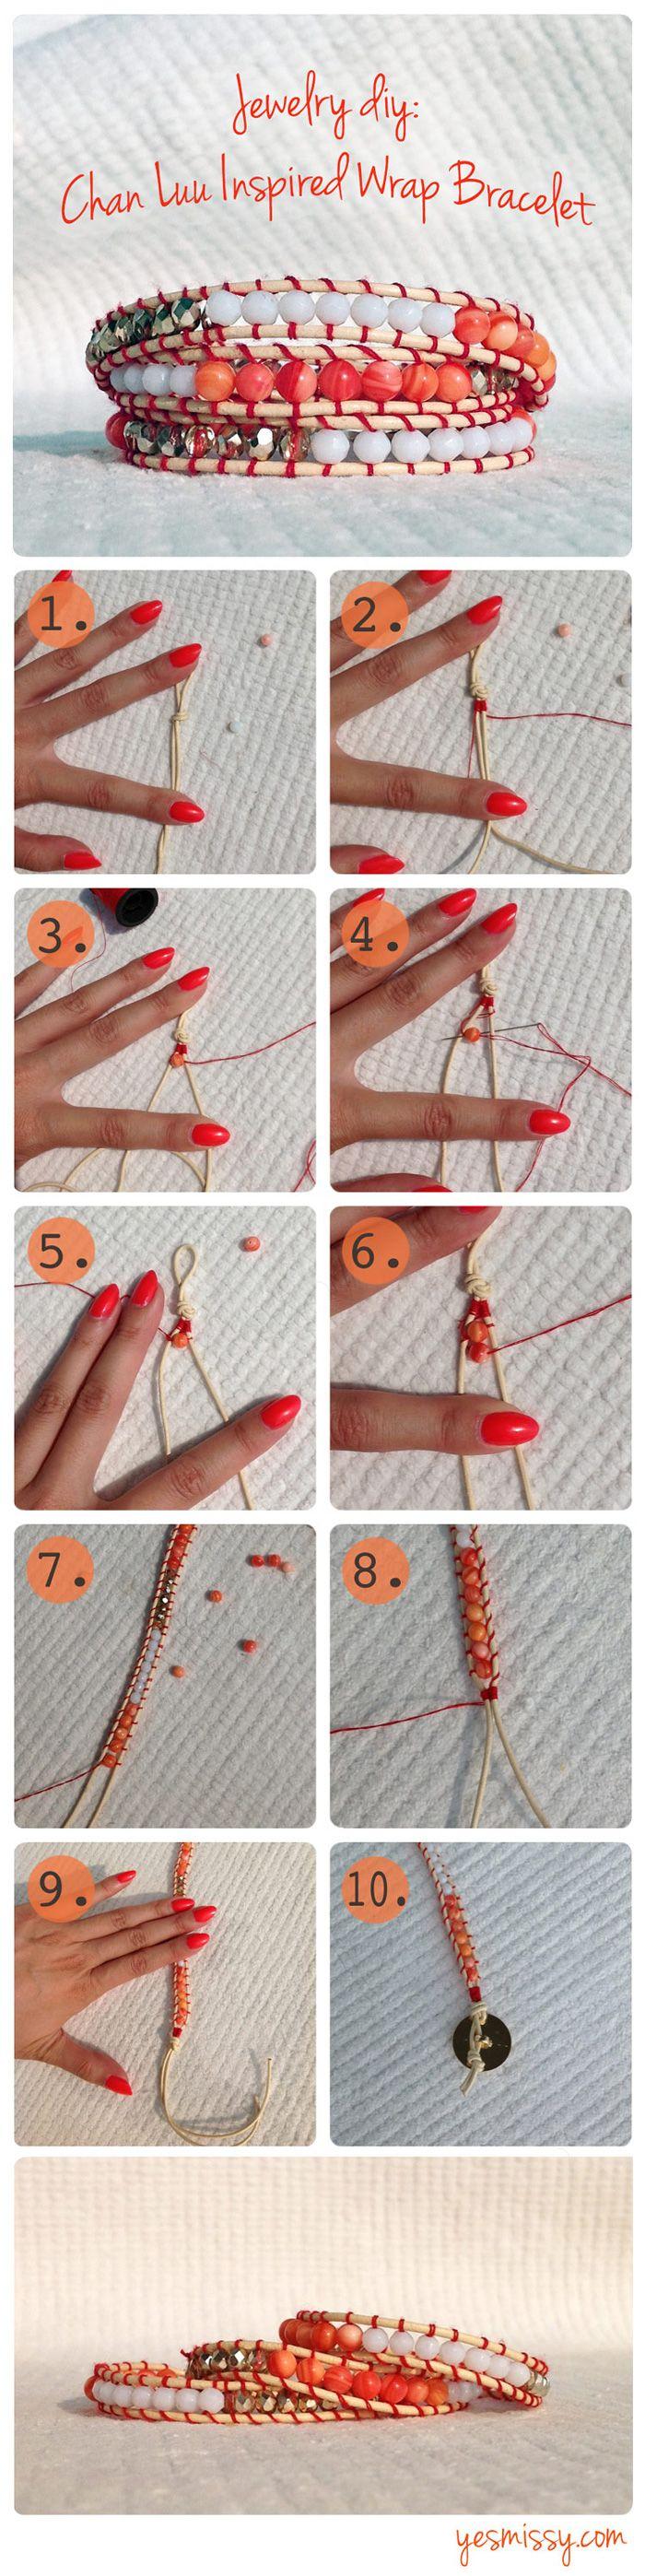 DIY Jewelry: Chan Luu Bracelet Tutorial